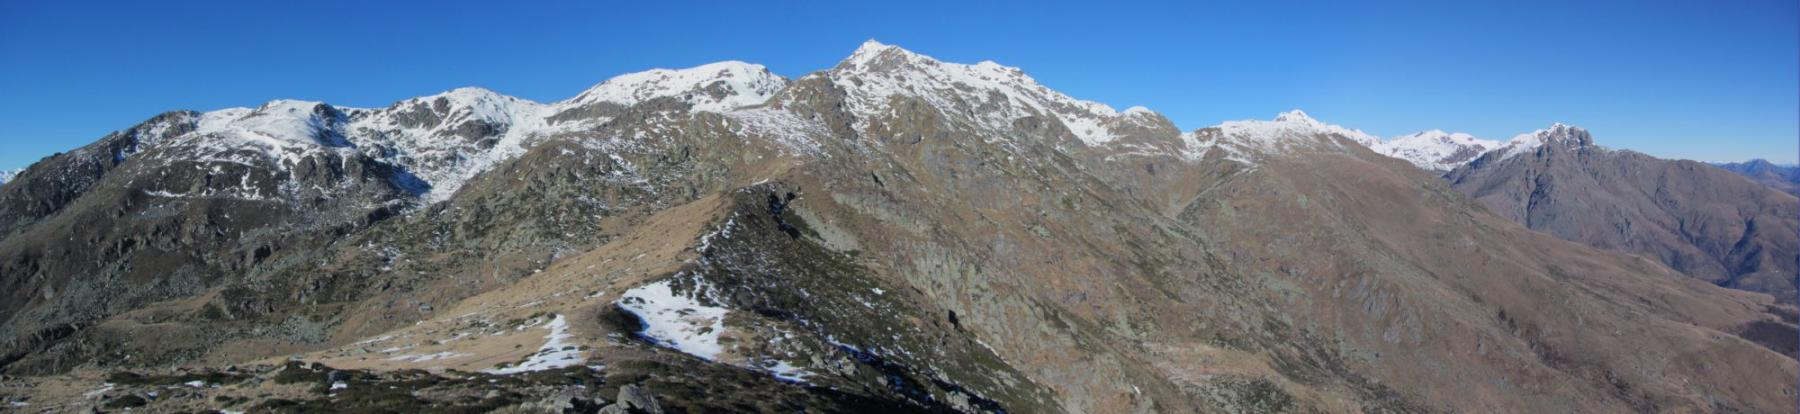 Panorama sulle Alpi Biellesi